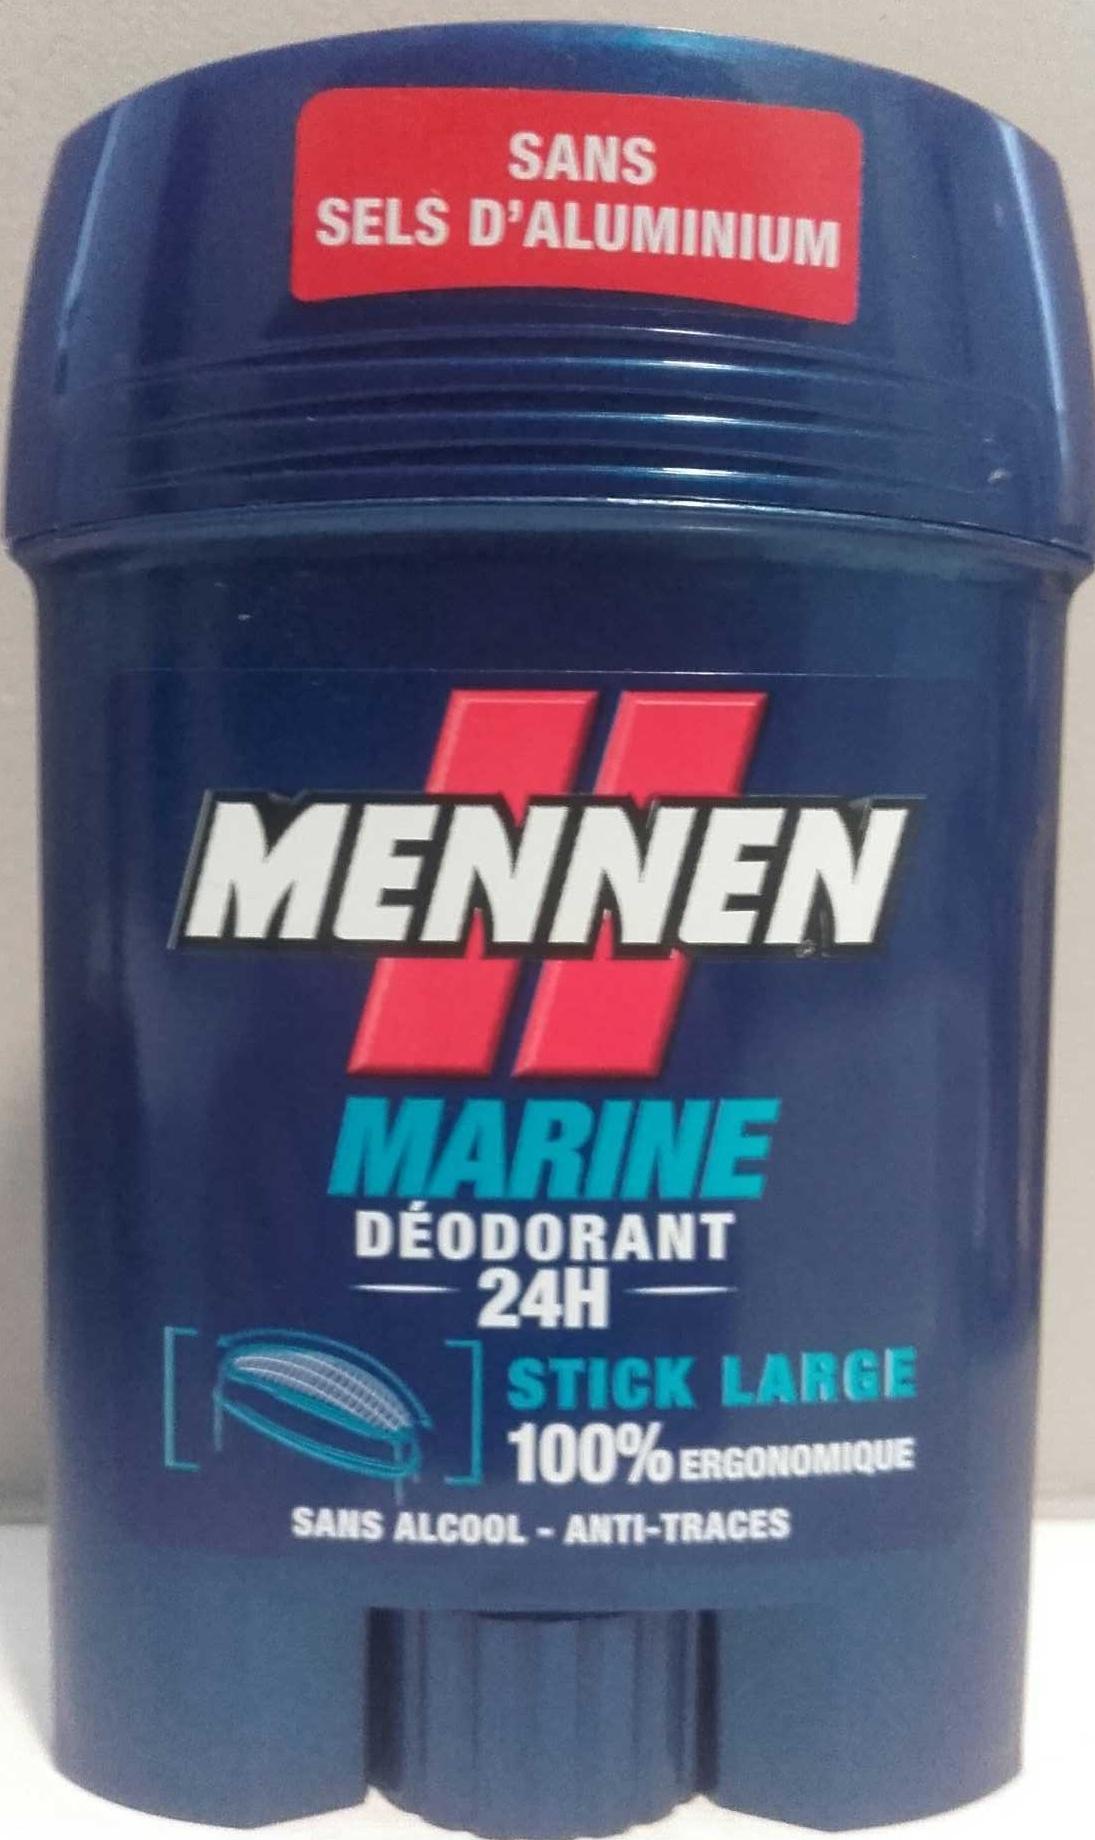 Déodorant Marine 24h - Produit